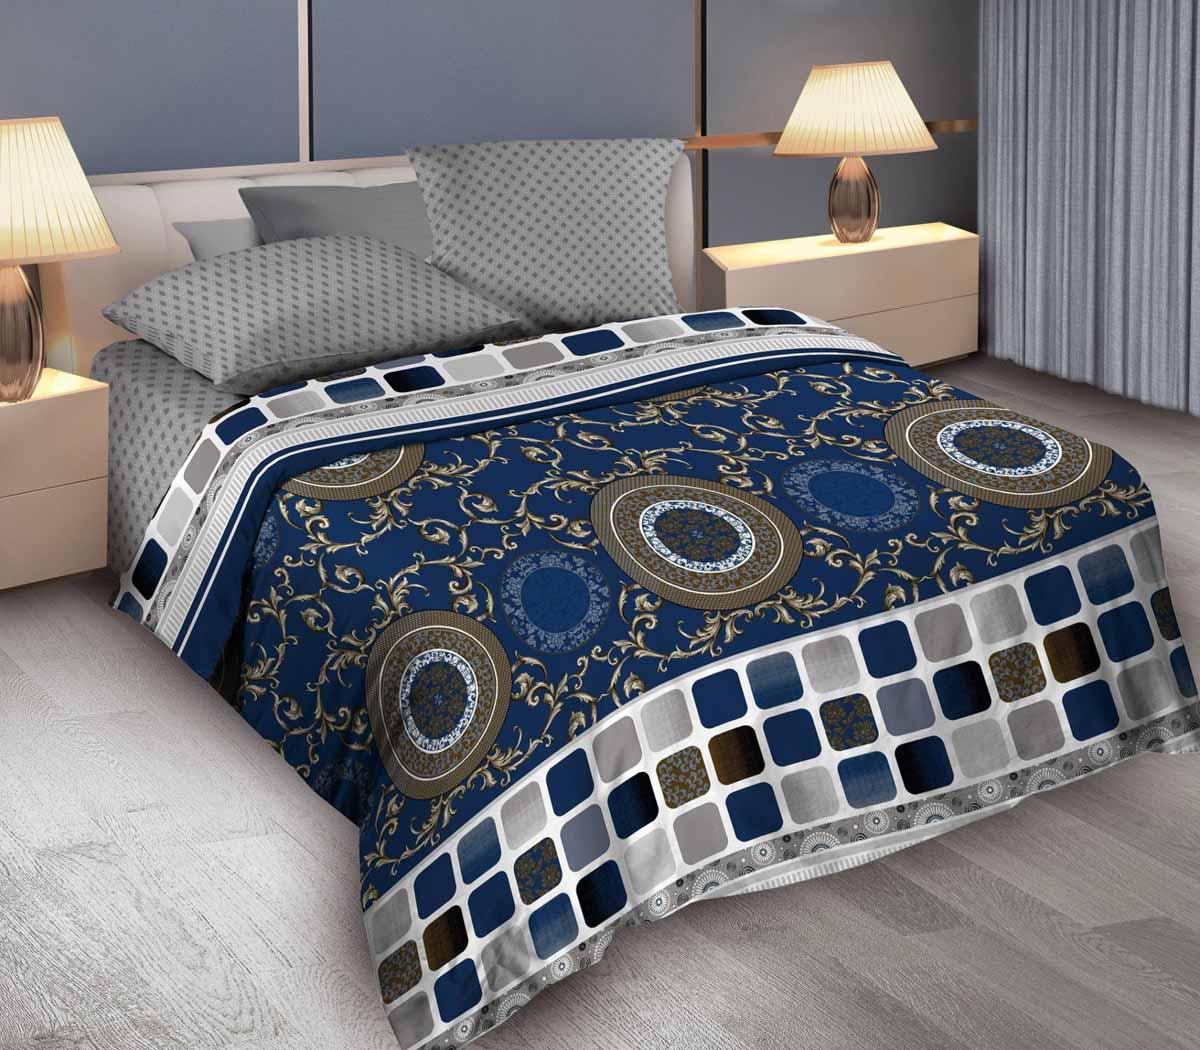 Комплект белья Wenge Bruno, евро, наволочки 70x70, цвет: синий364987